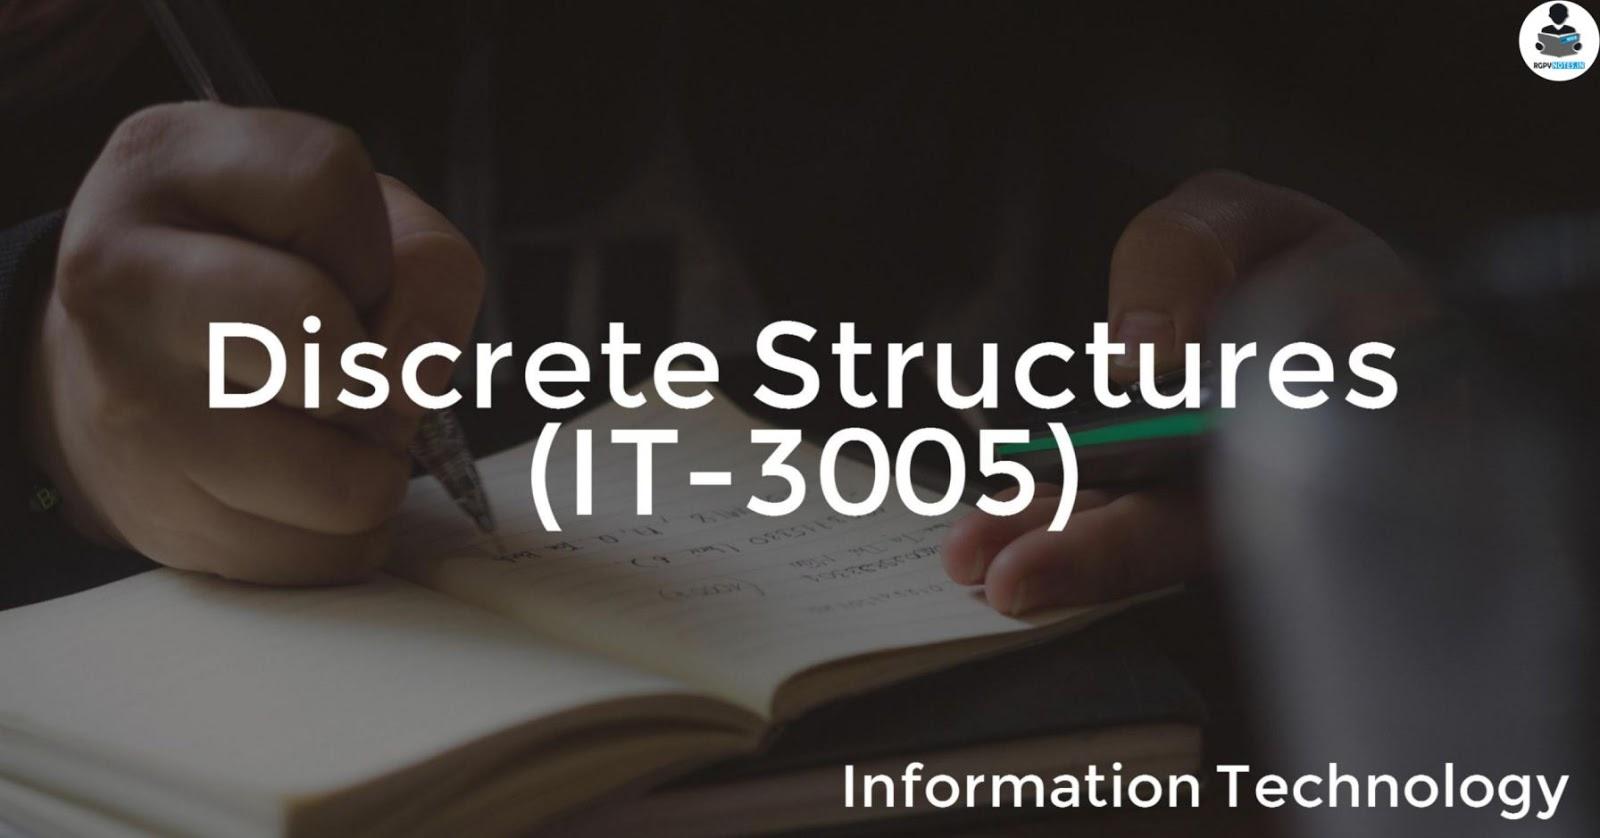 IT3005 - Discrete Structures - RGPV notes CBGS